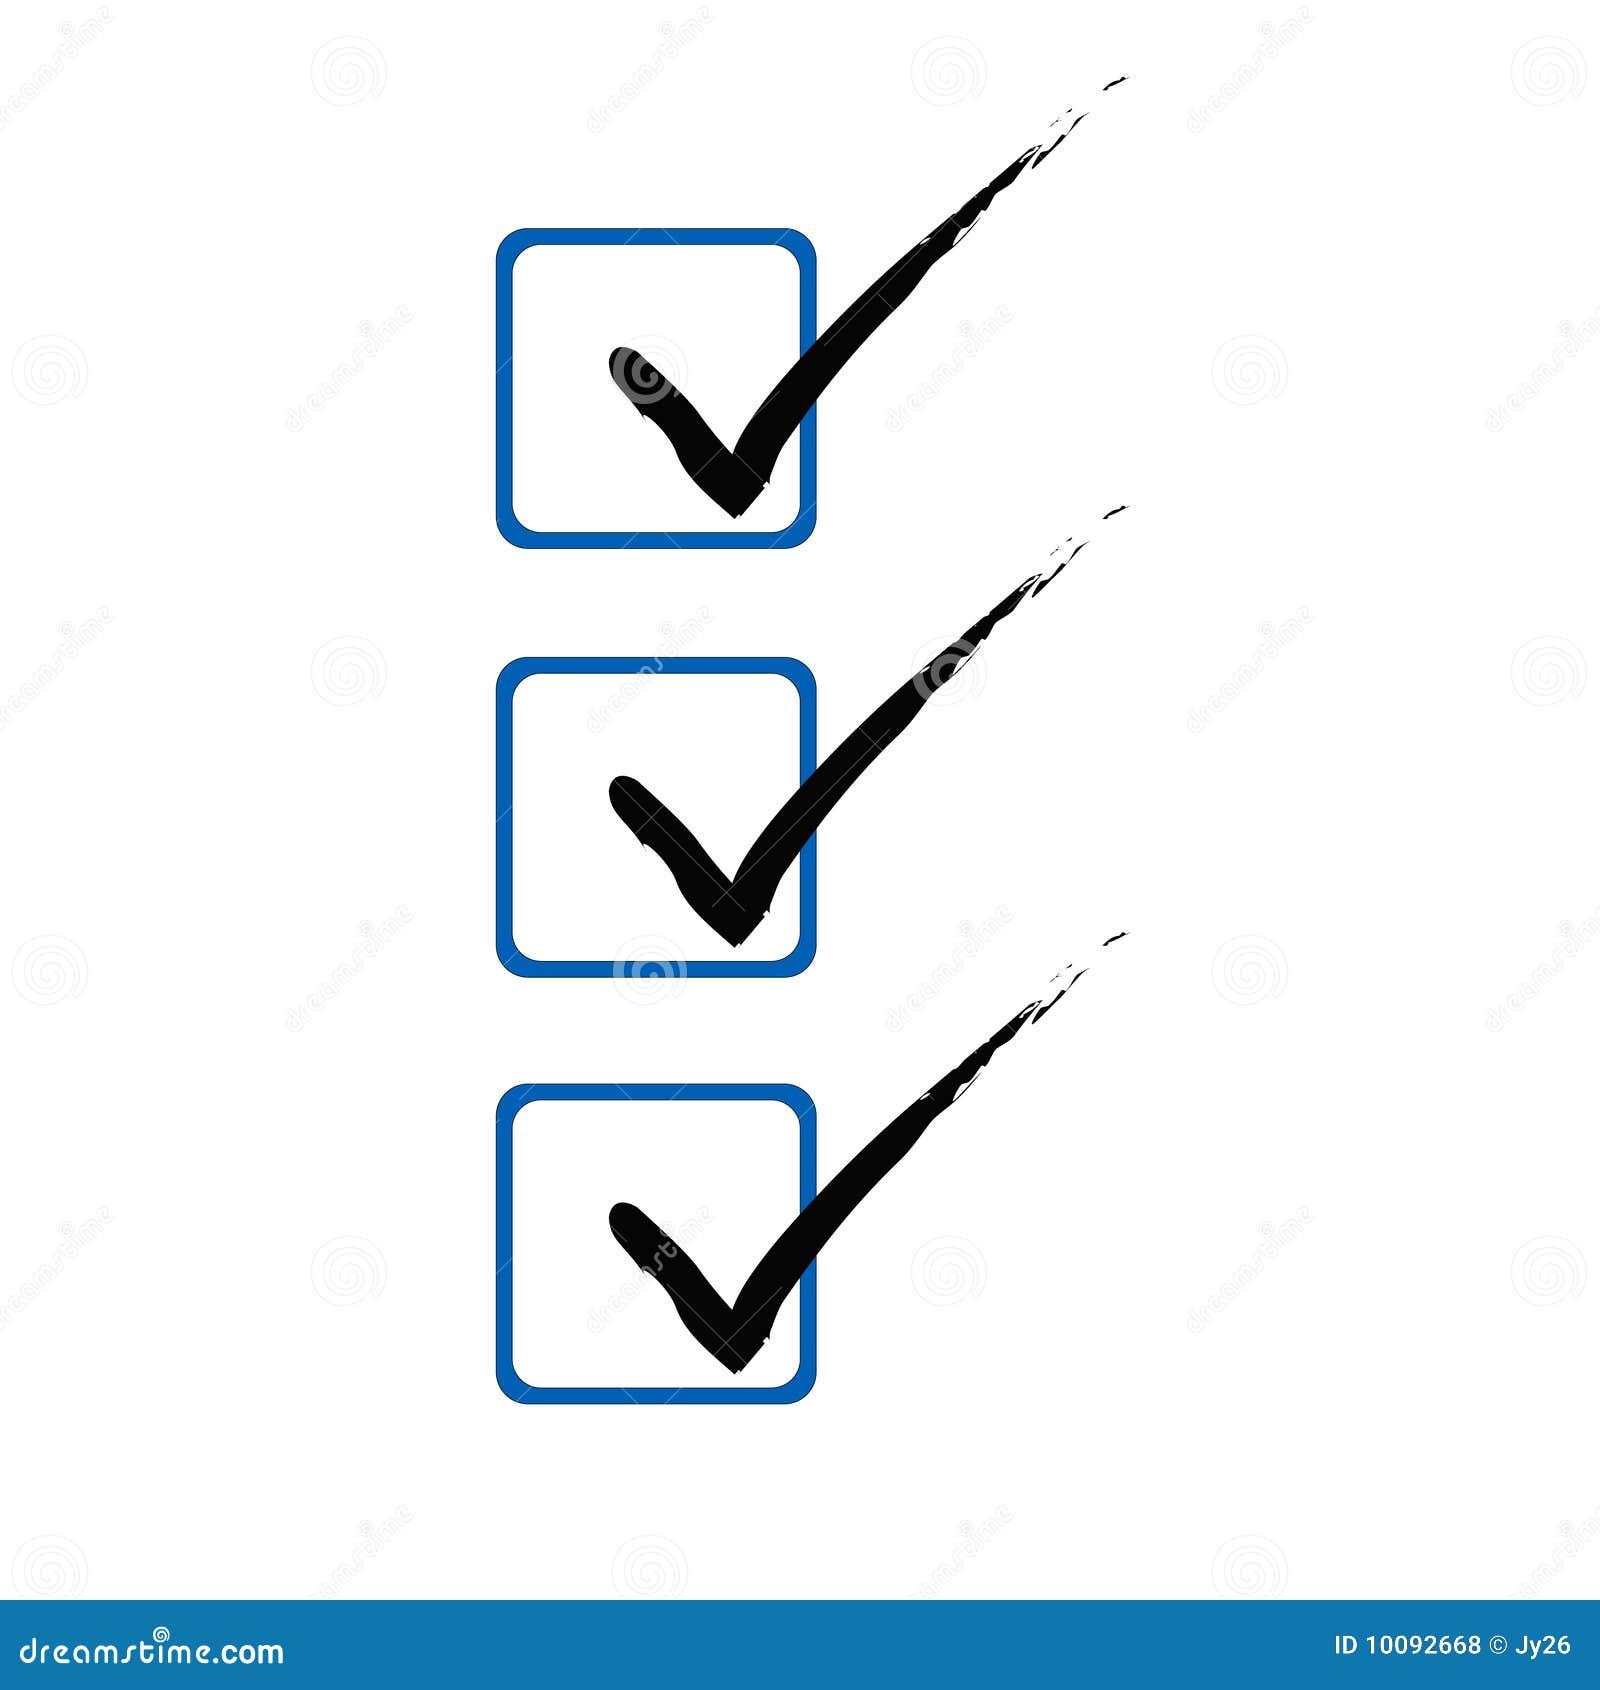 how to get tick symbol